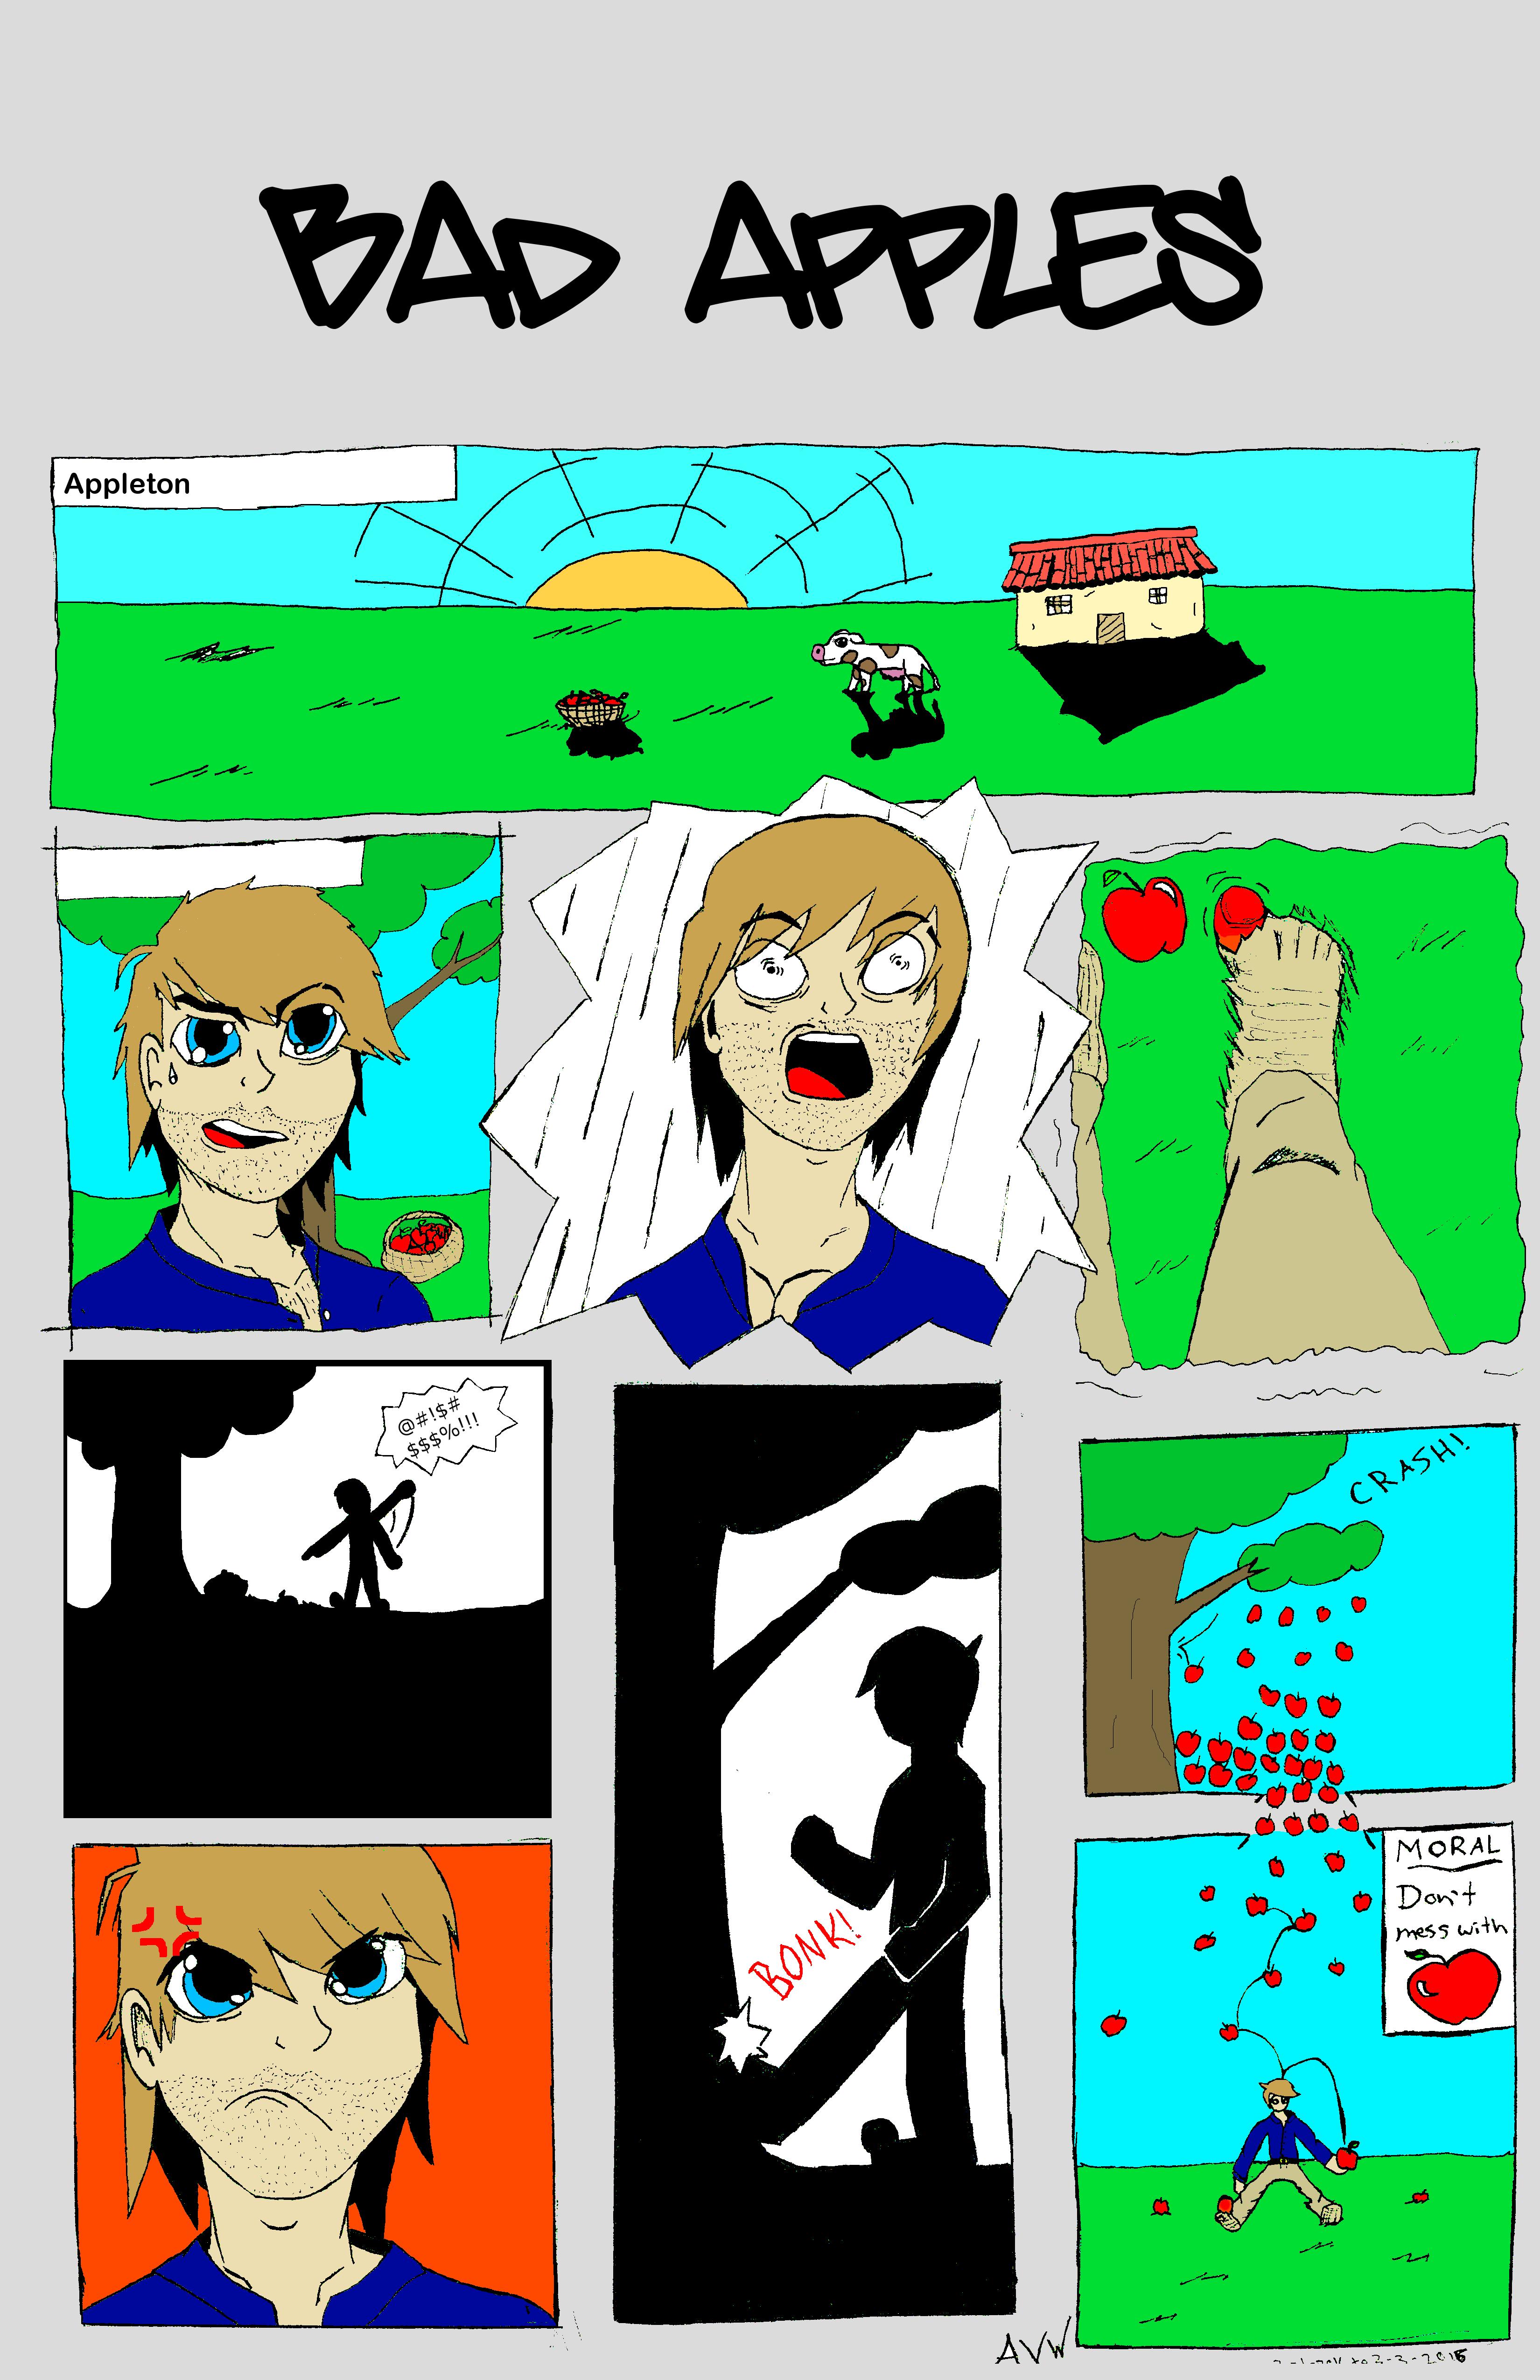 Bad Apples - Comic Strip (1)